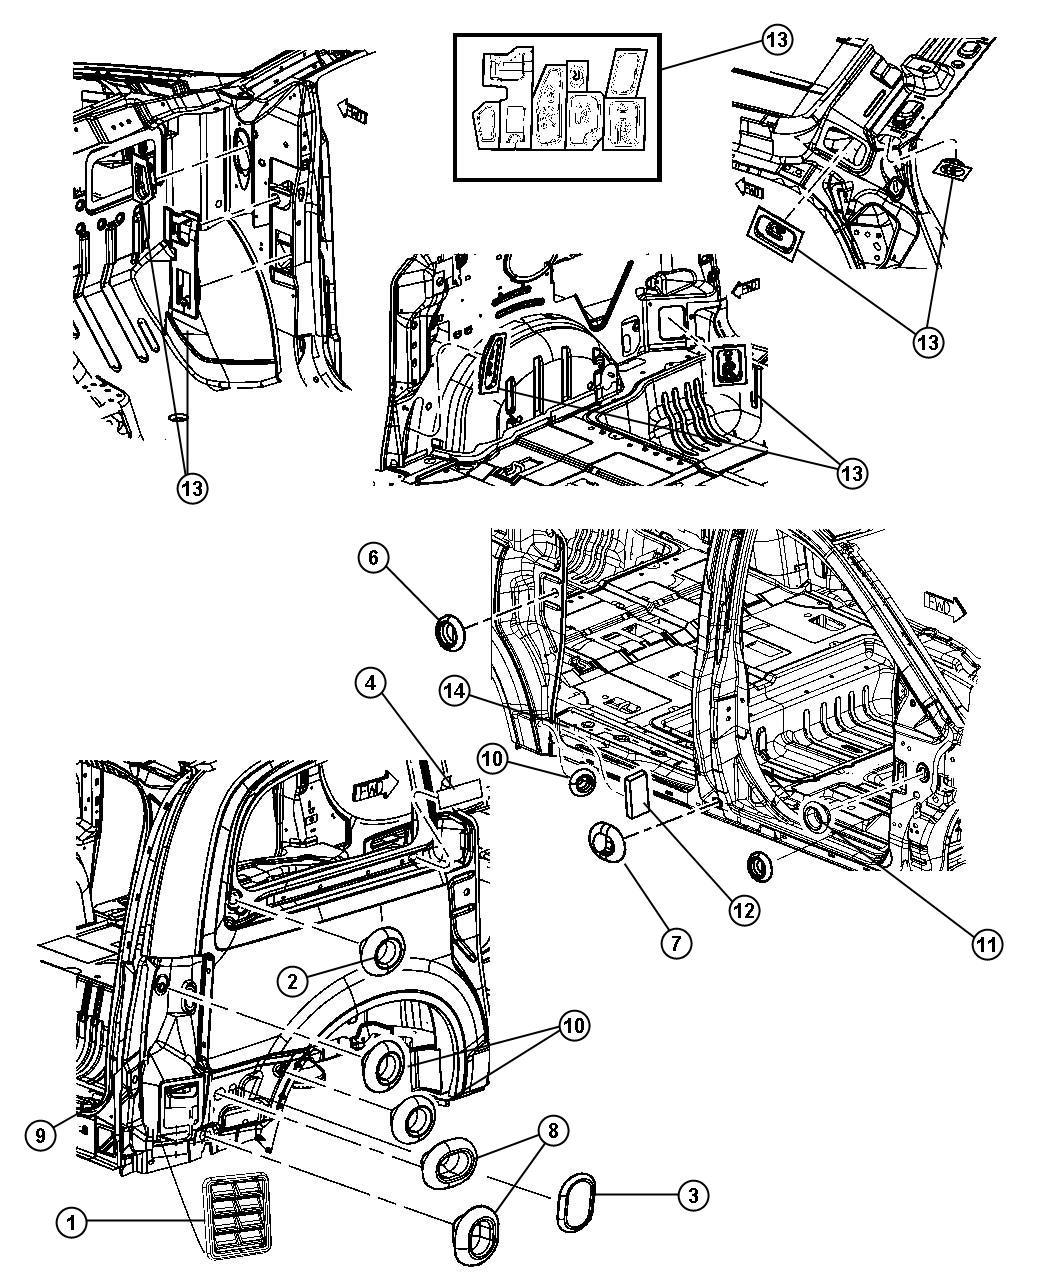 2011 Dodge Grand Caravan Plug. Body. 25.4mm x 38.1mm